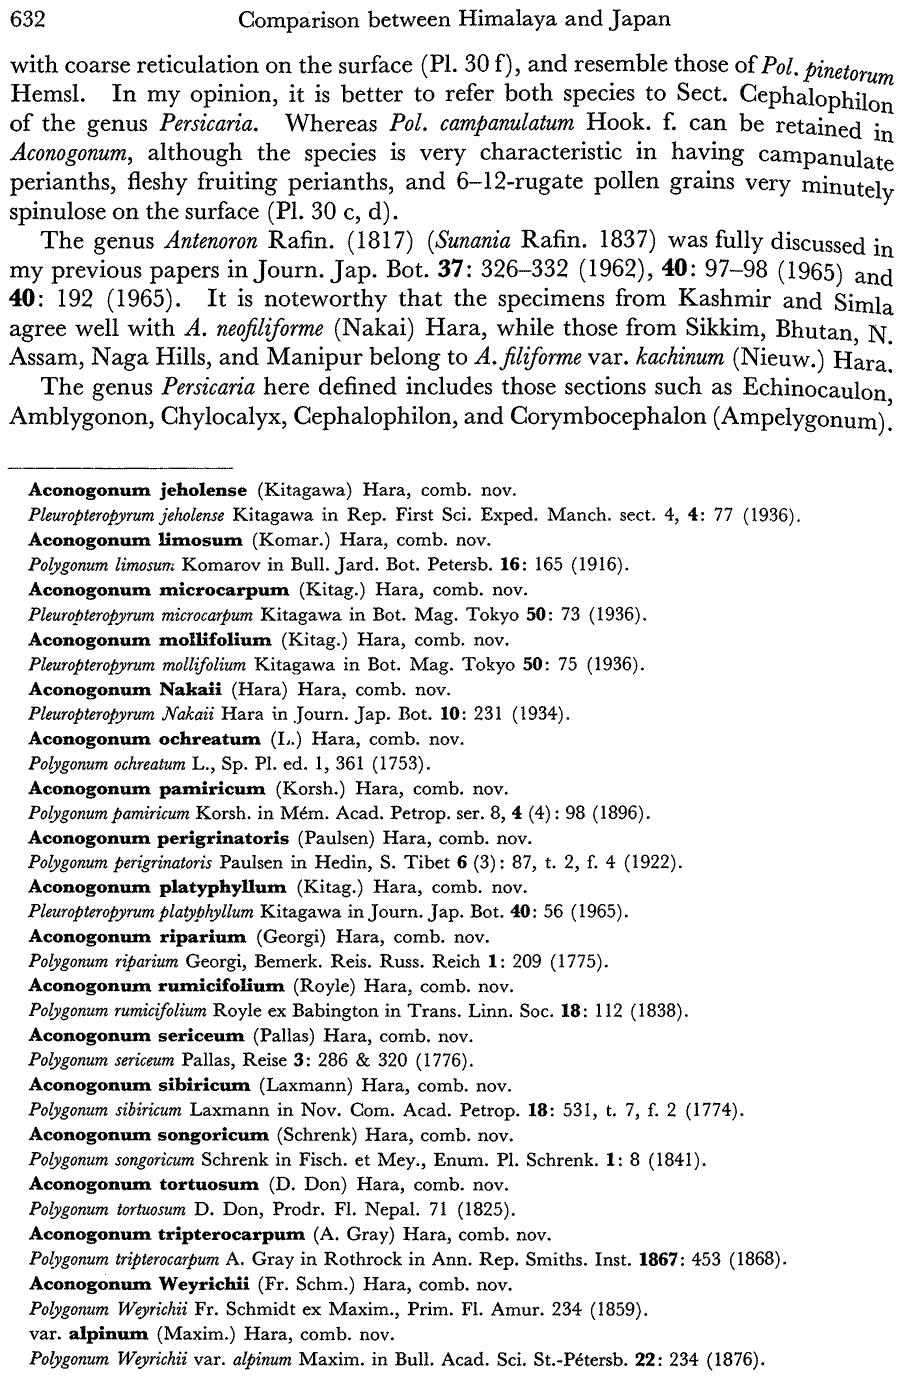 http://forum.plantarium.ru/misc.php?action=pun_attachment&item=19813